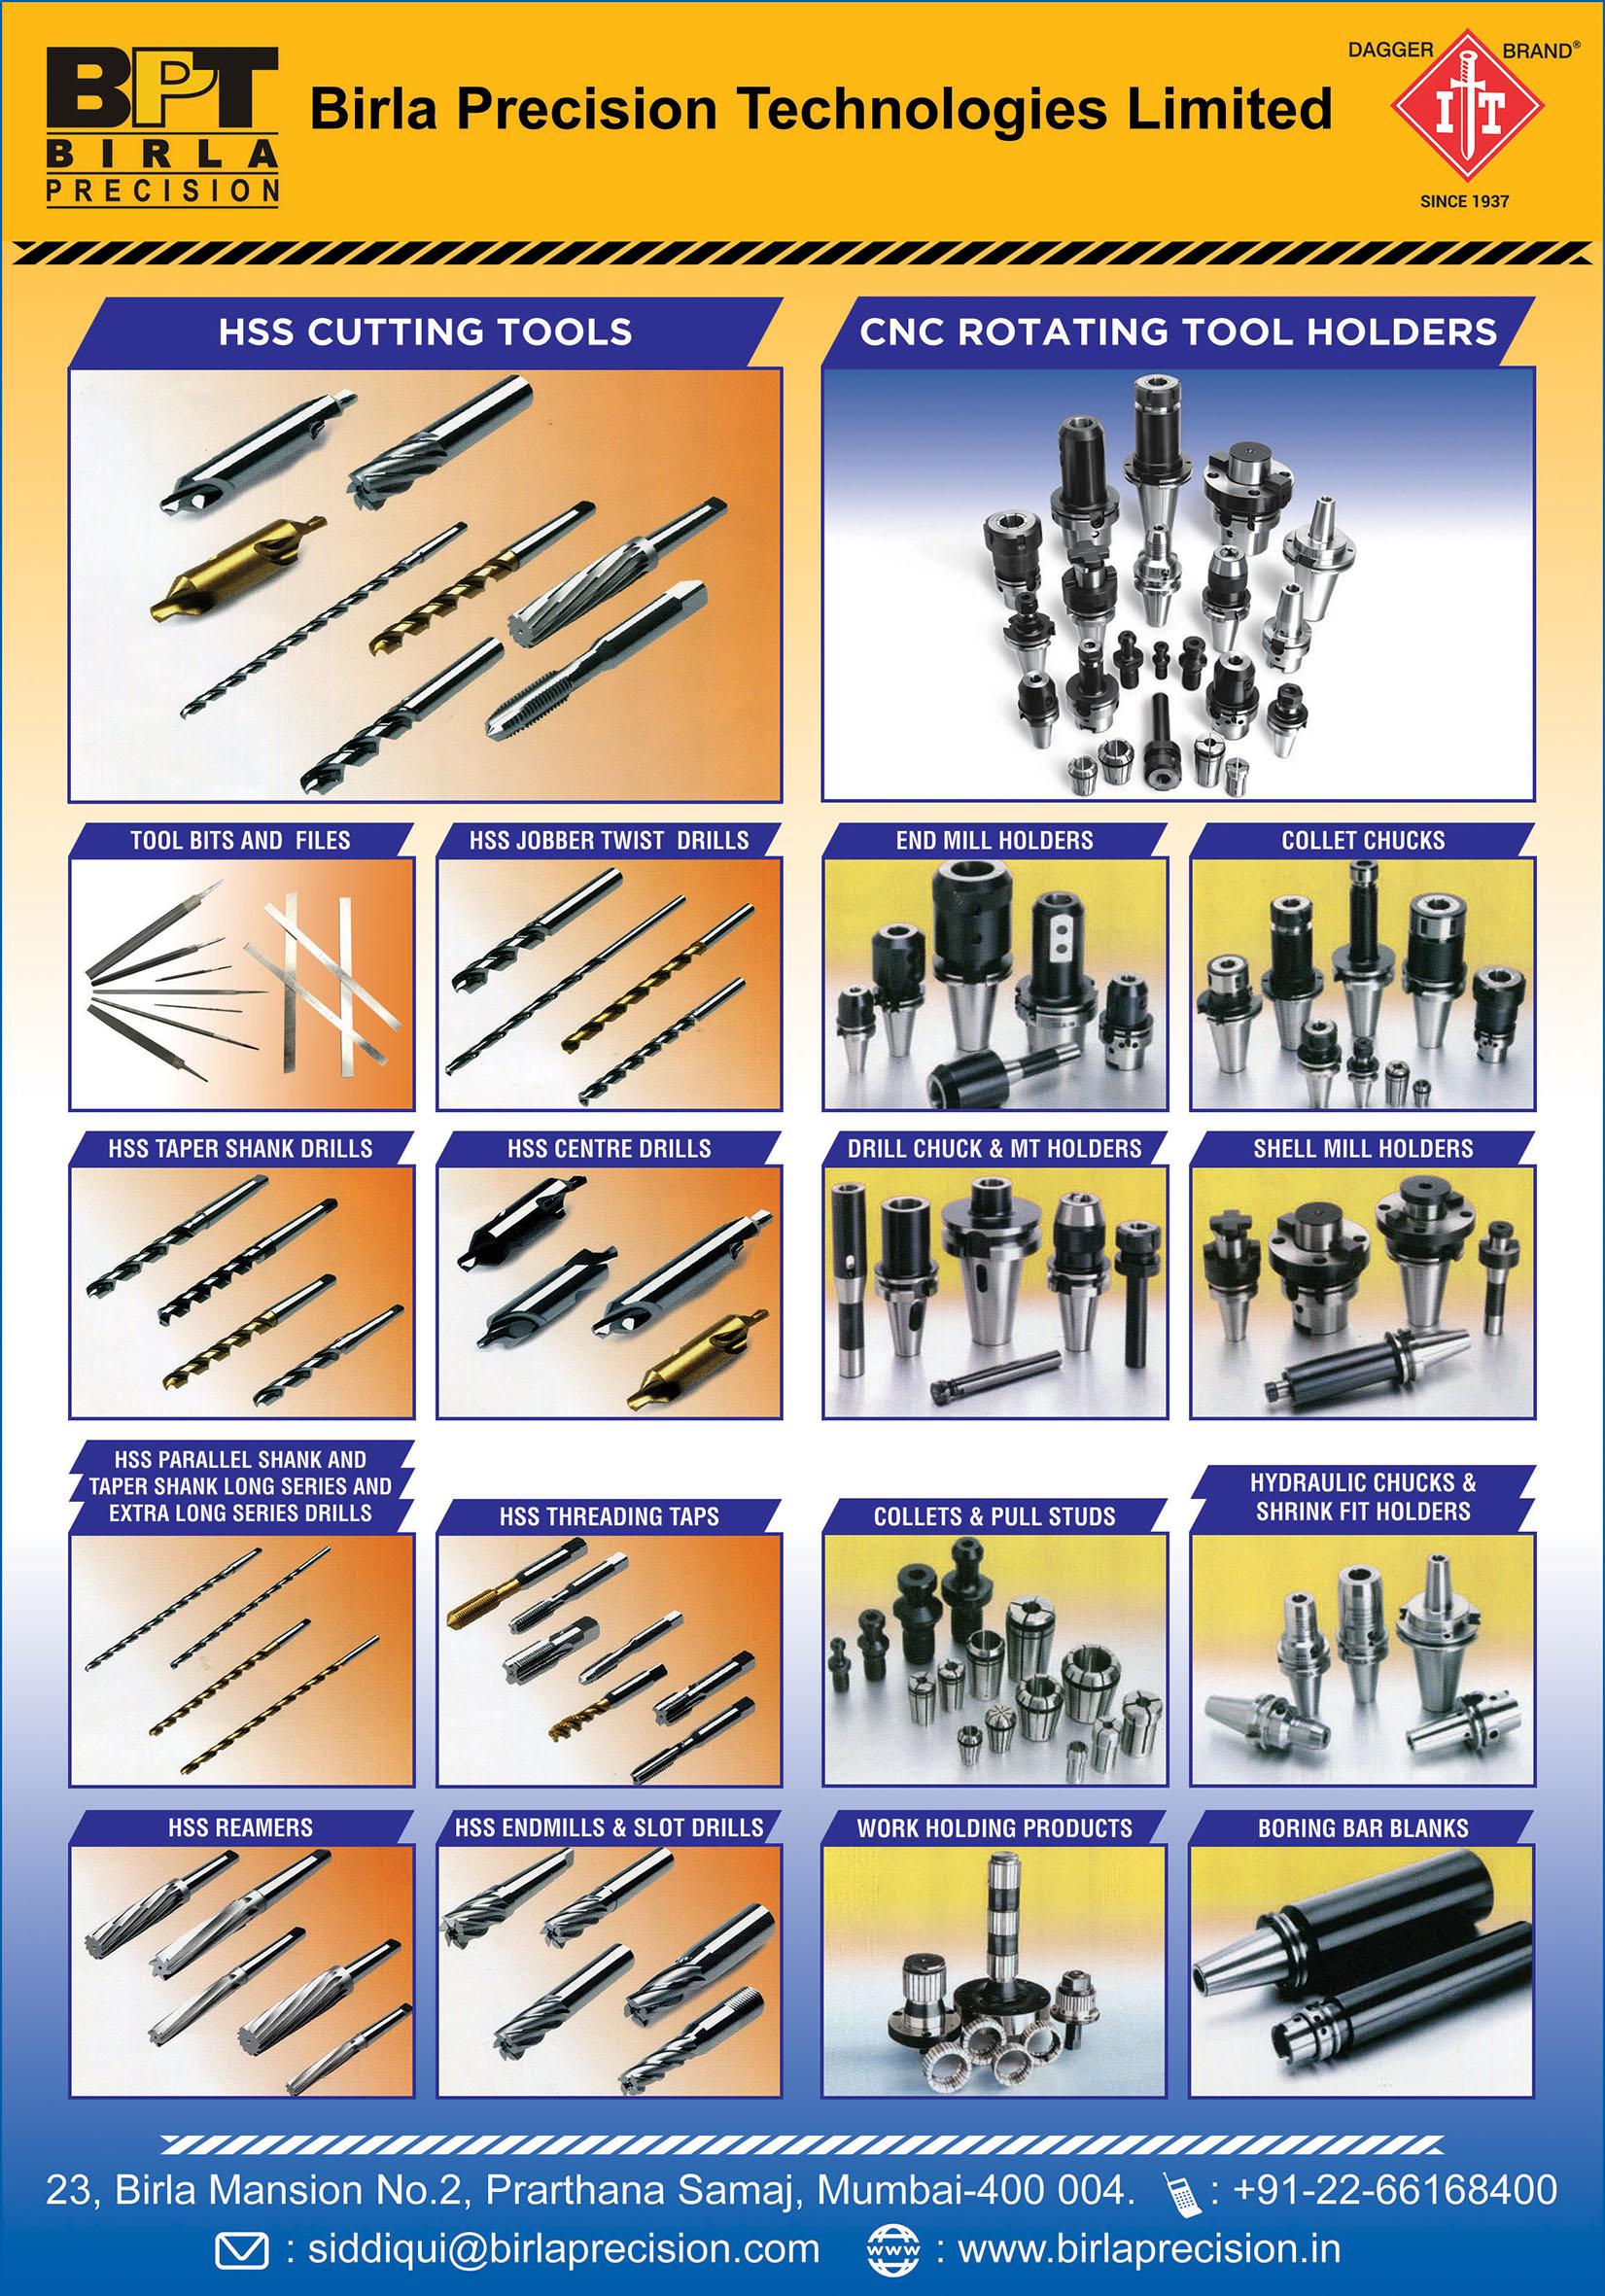 Birla Precision Technologies Ltd.